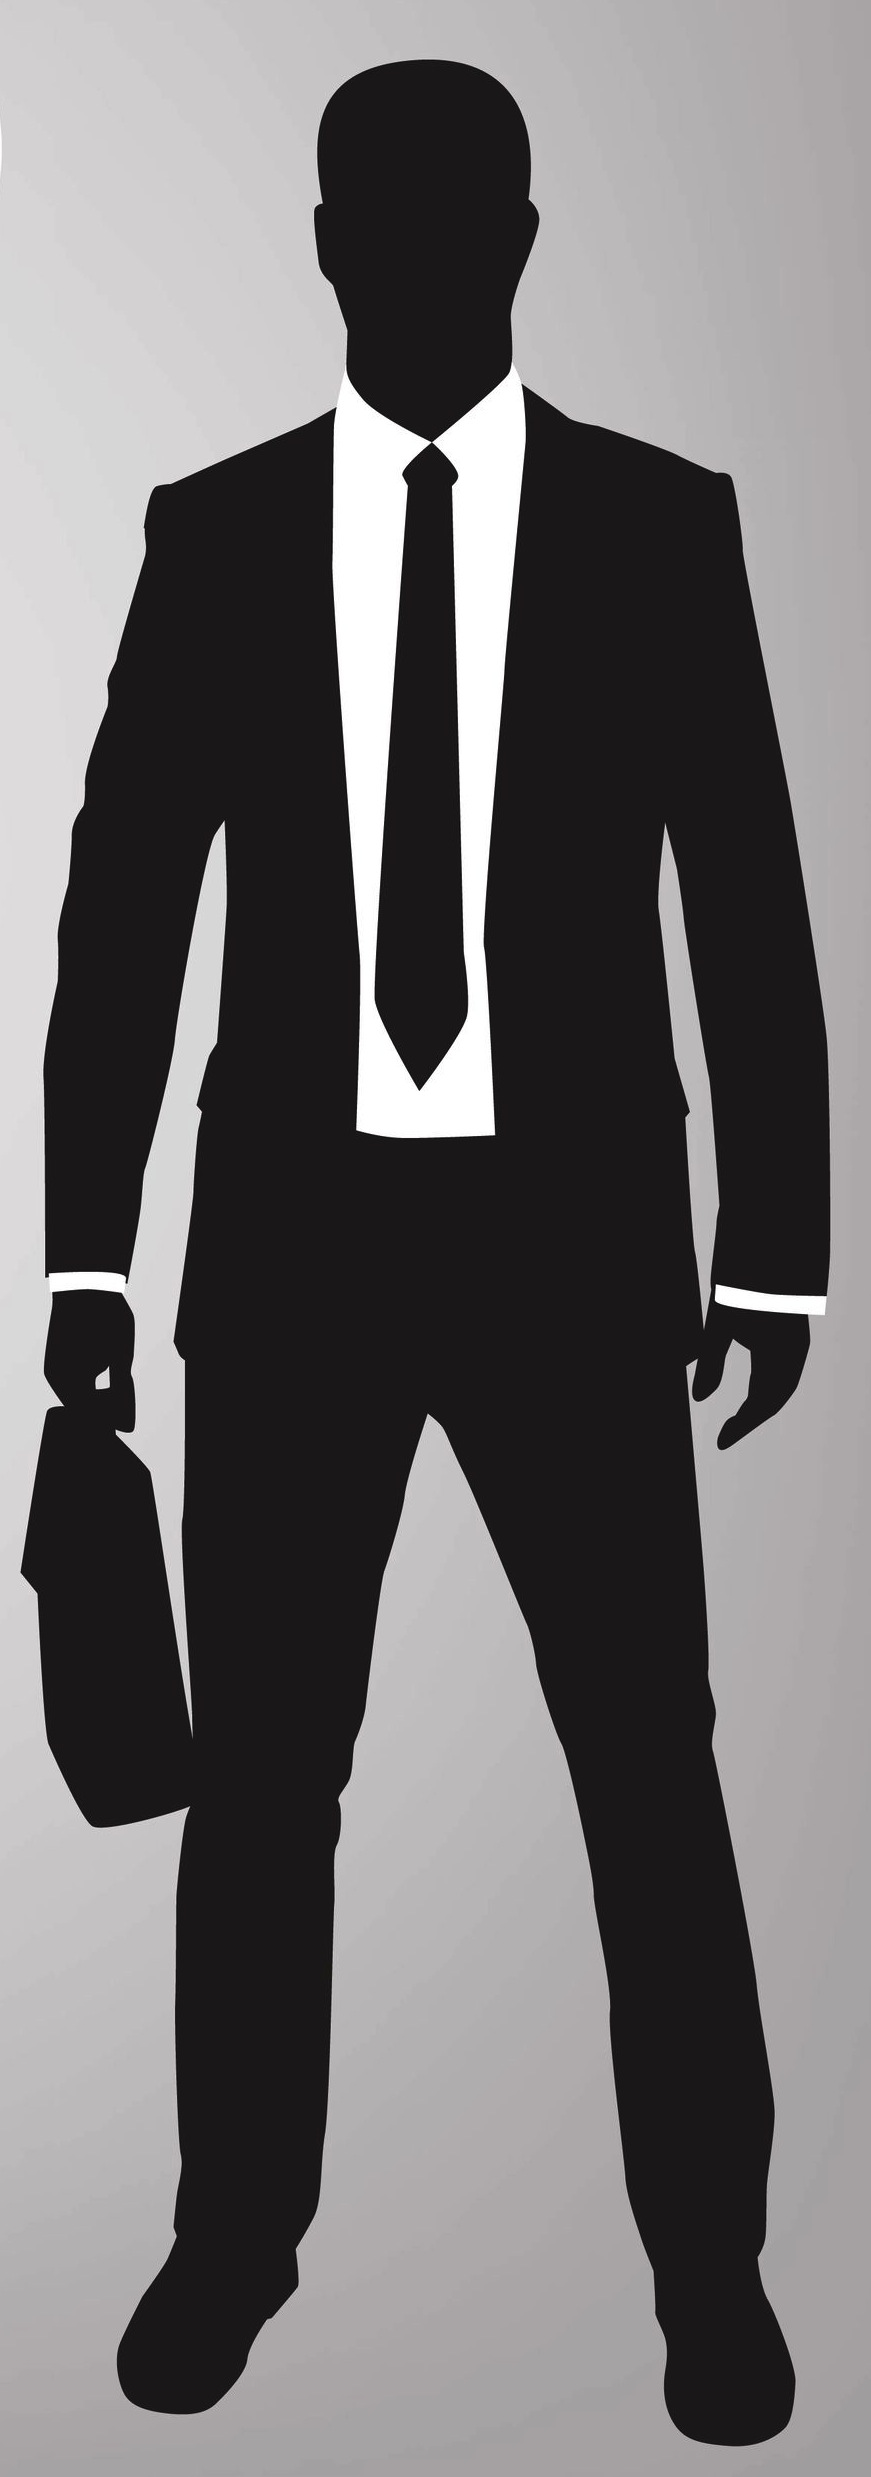 suit silhouette copy.jpg